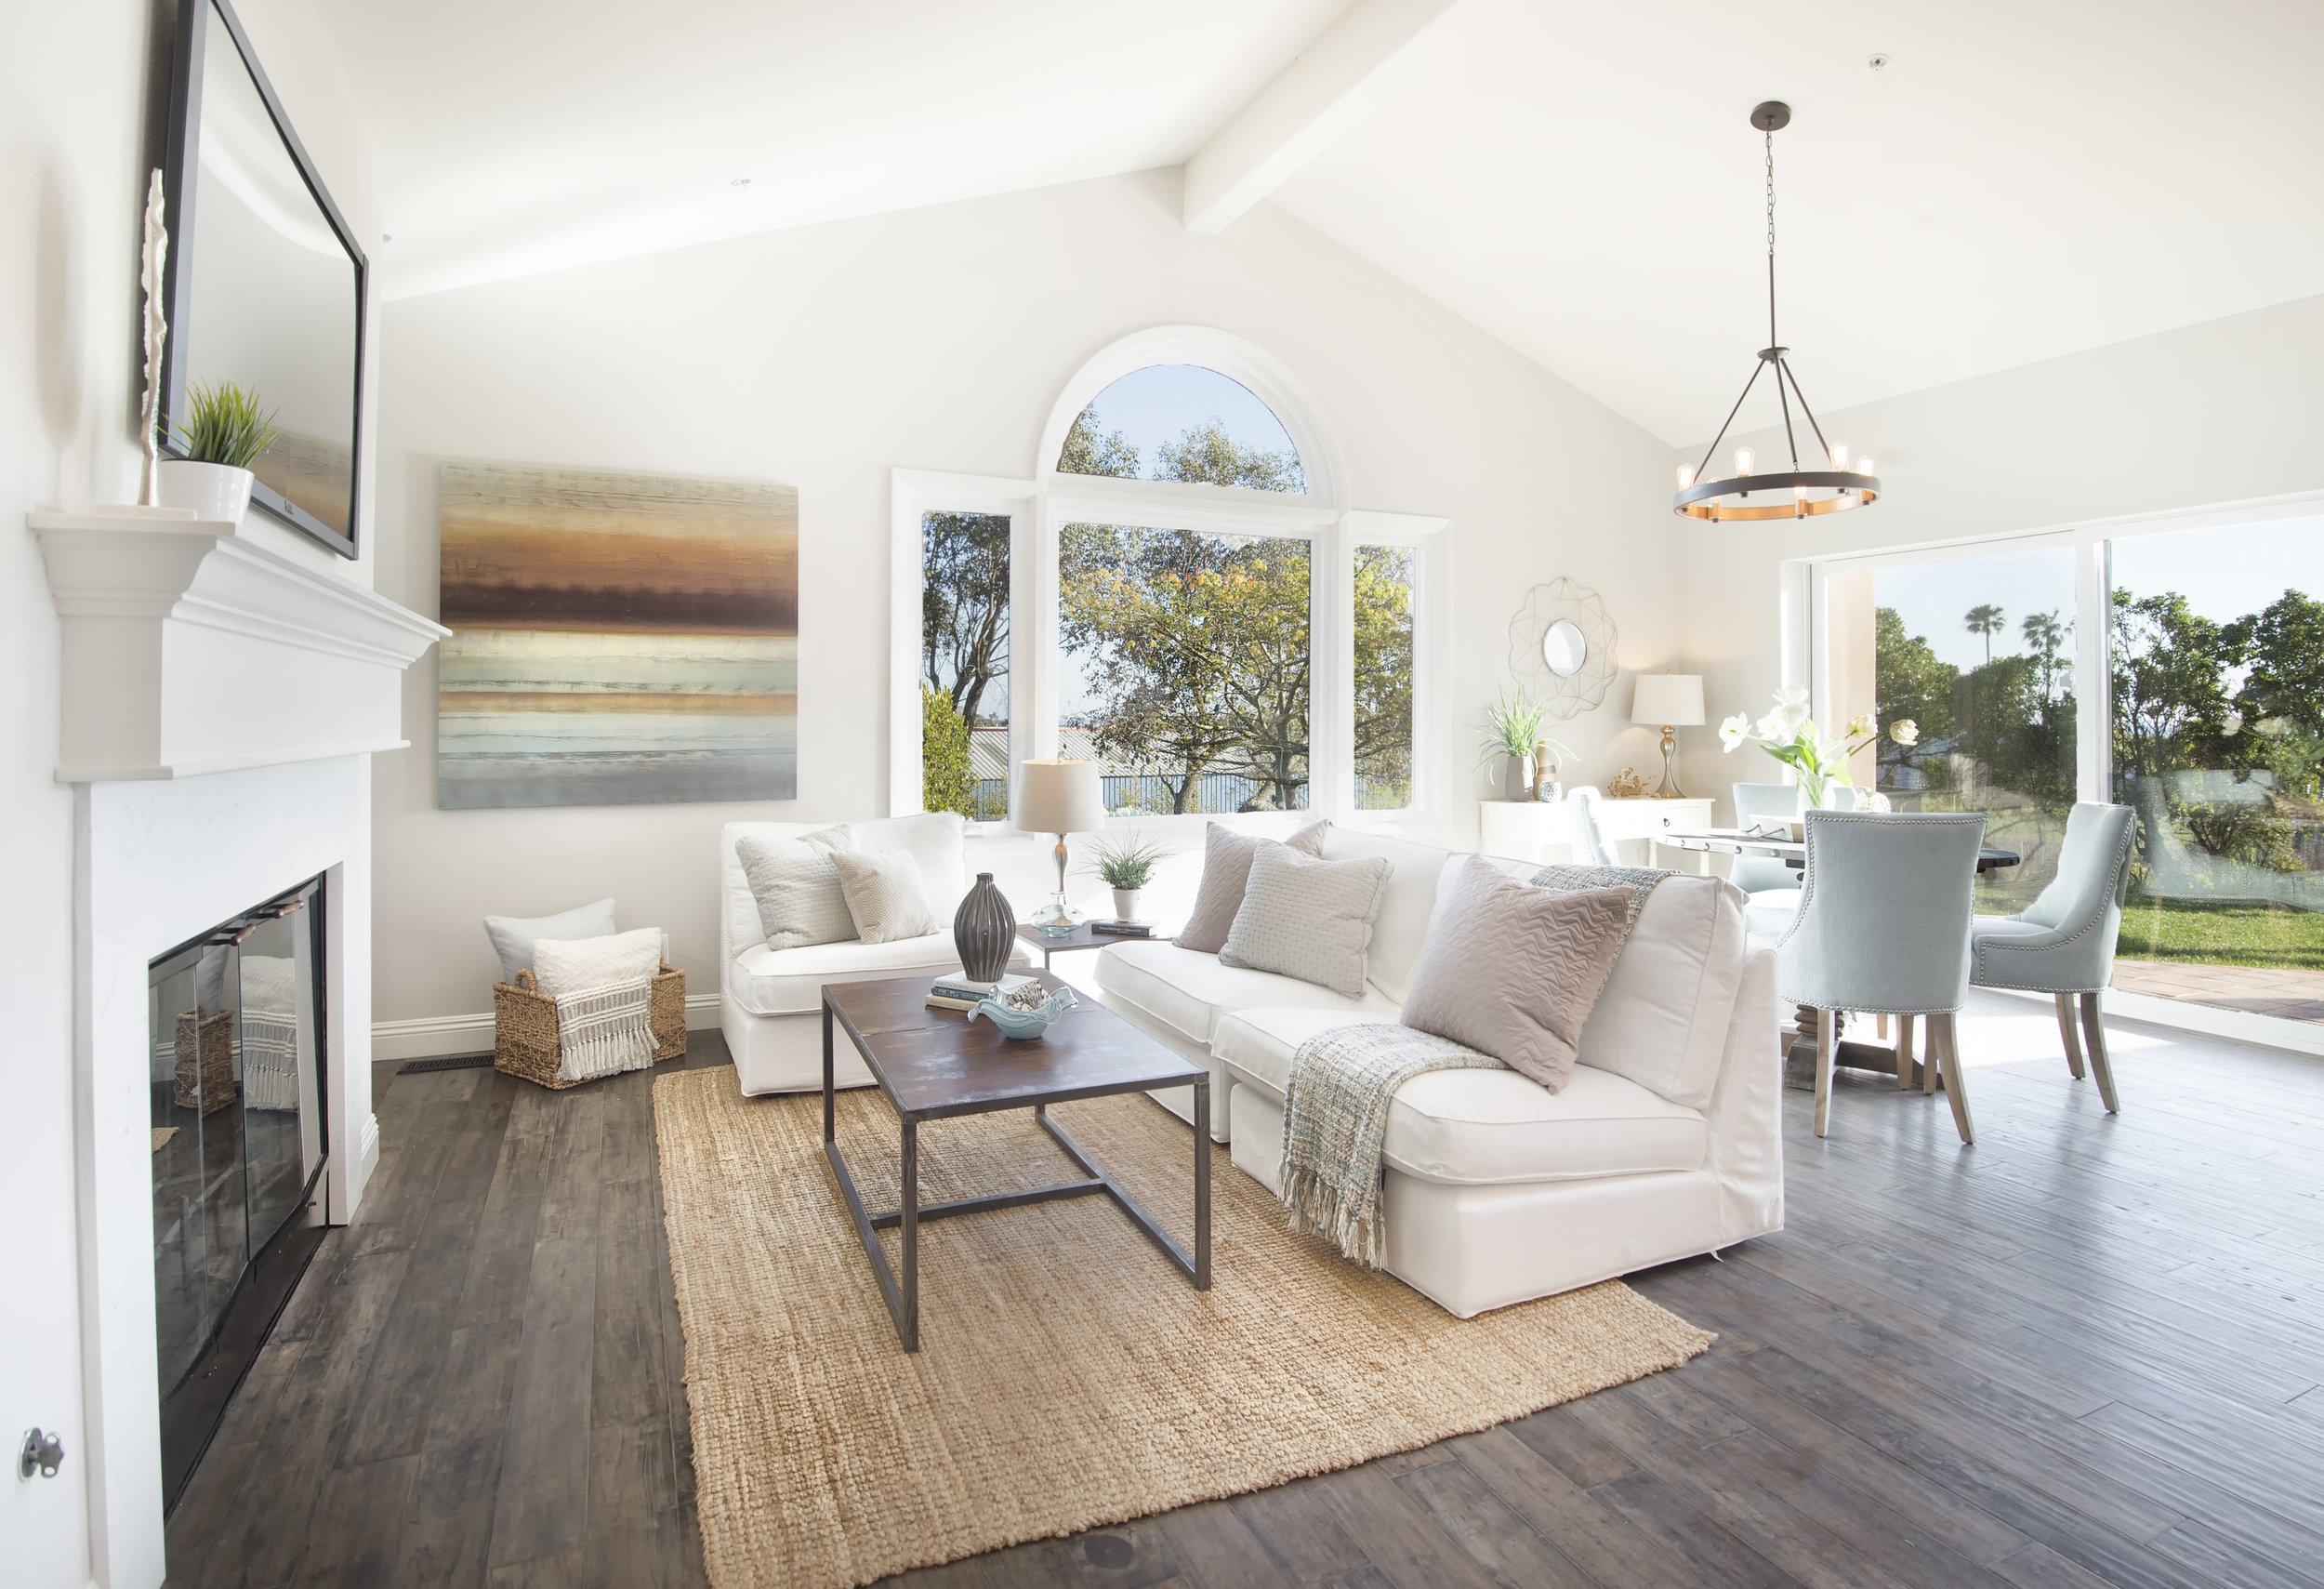 007 6130 Via Cabrillo For Sale Lease The Malibu Life Team Luxury Real Estate.jpg